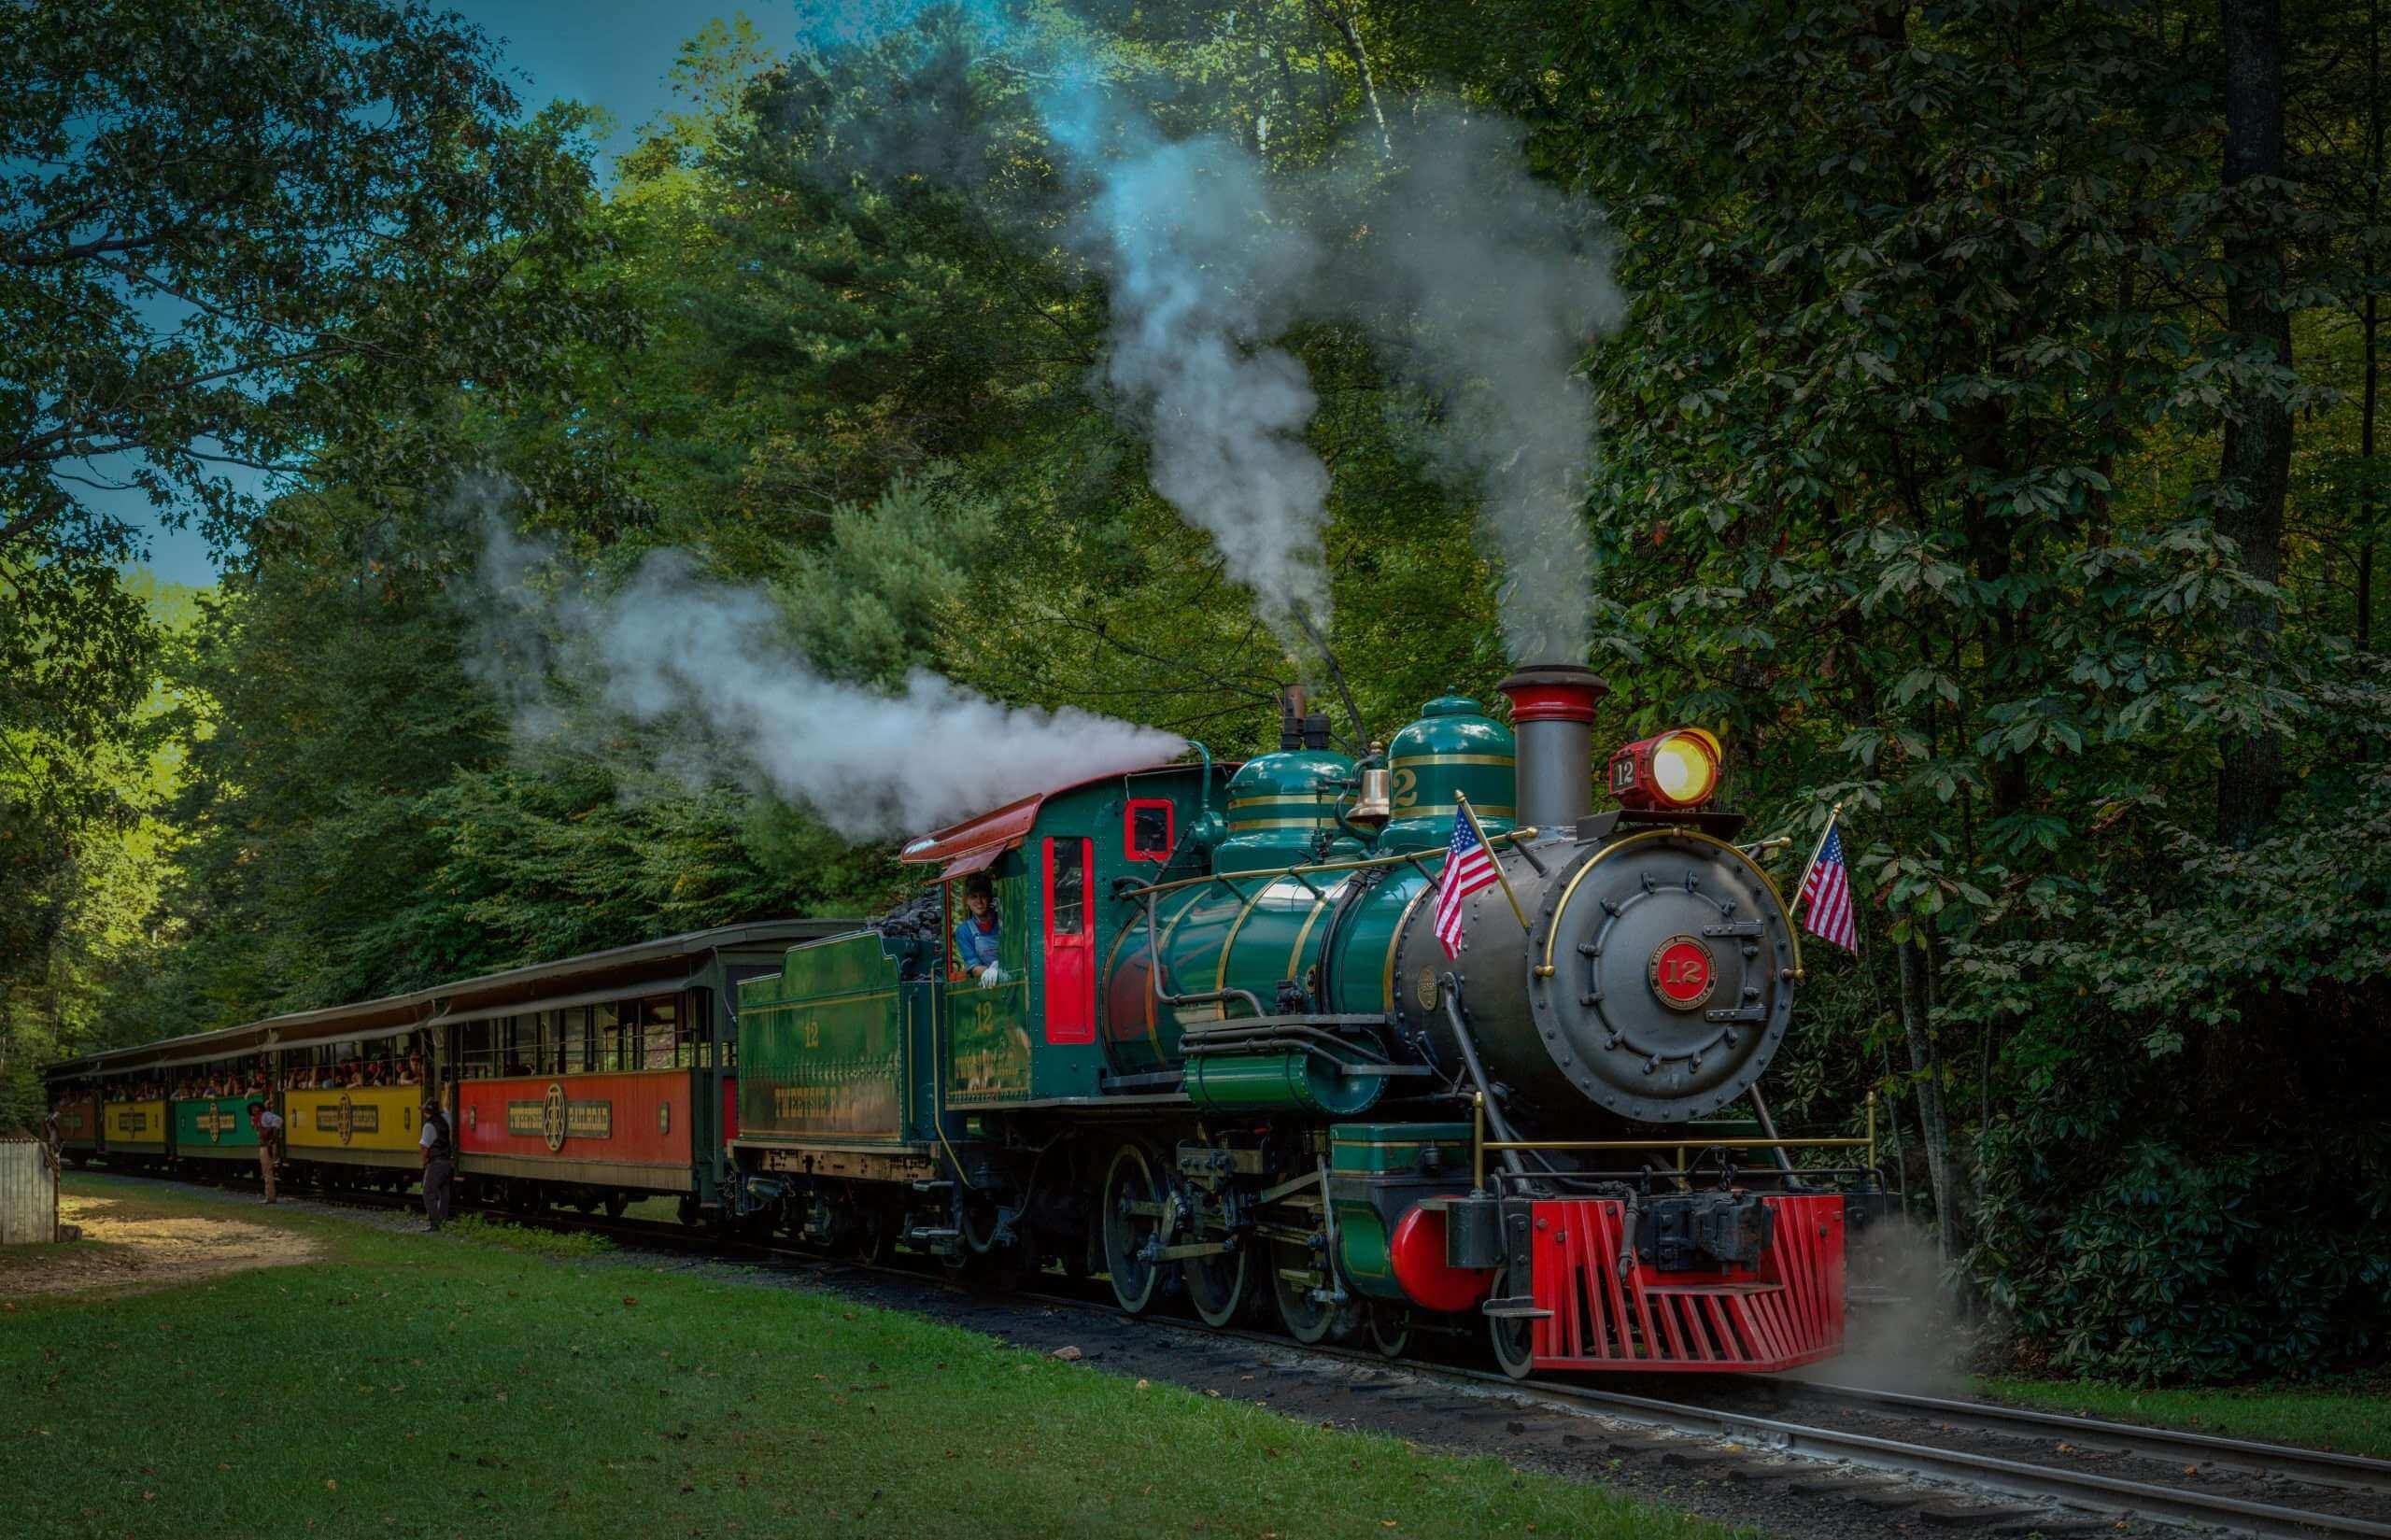 tweetsie locomotive 12